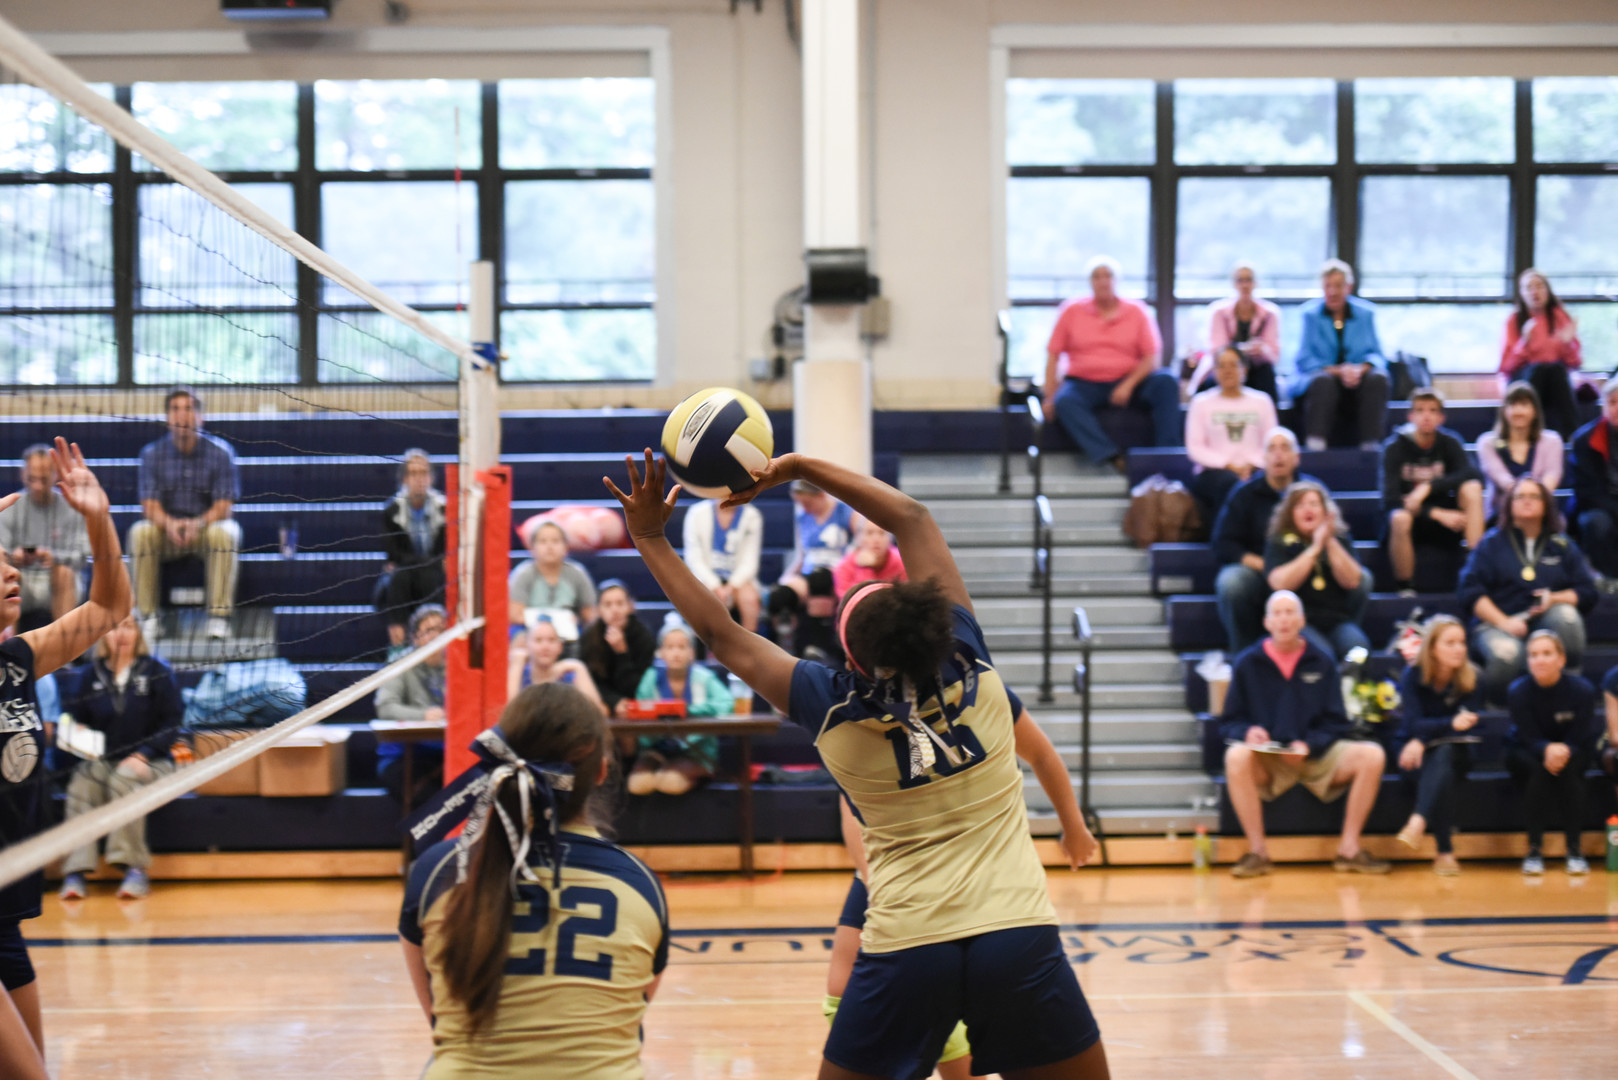 Volleyball-30.jpg